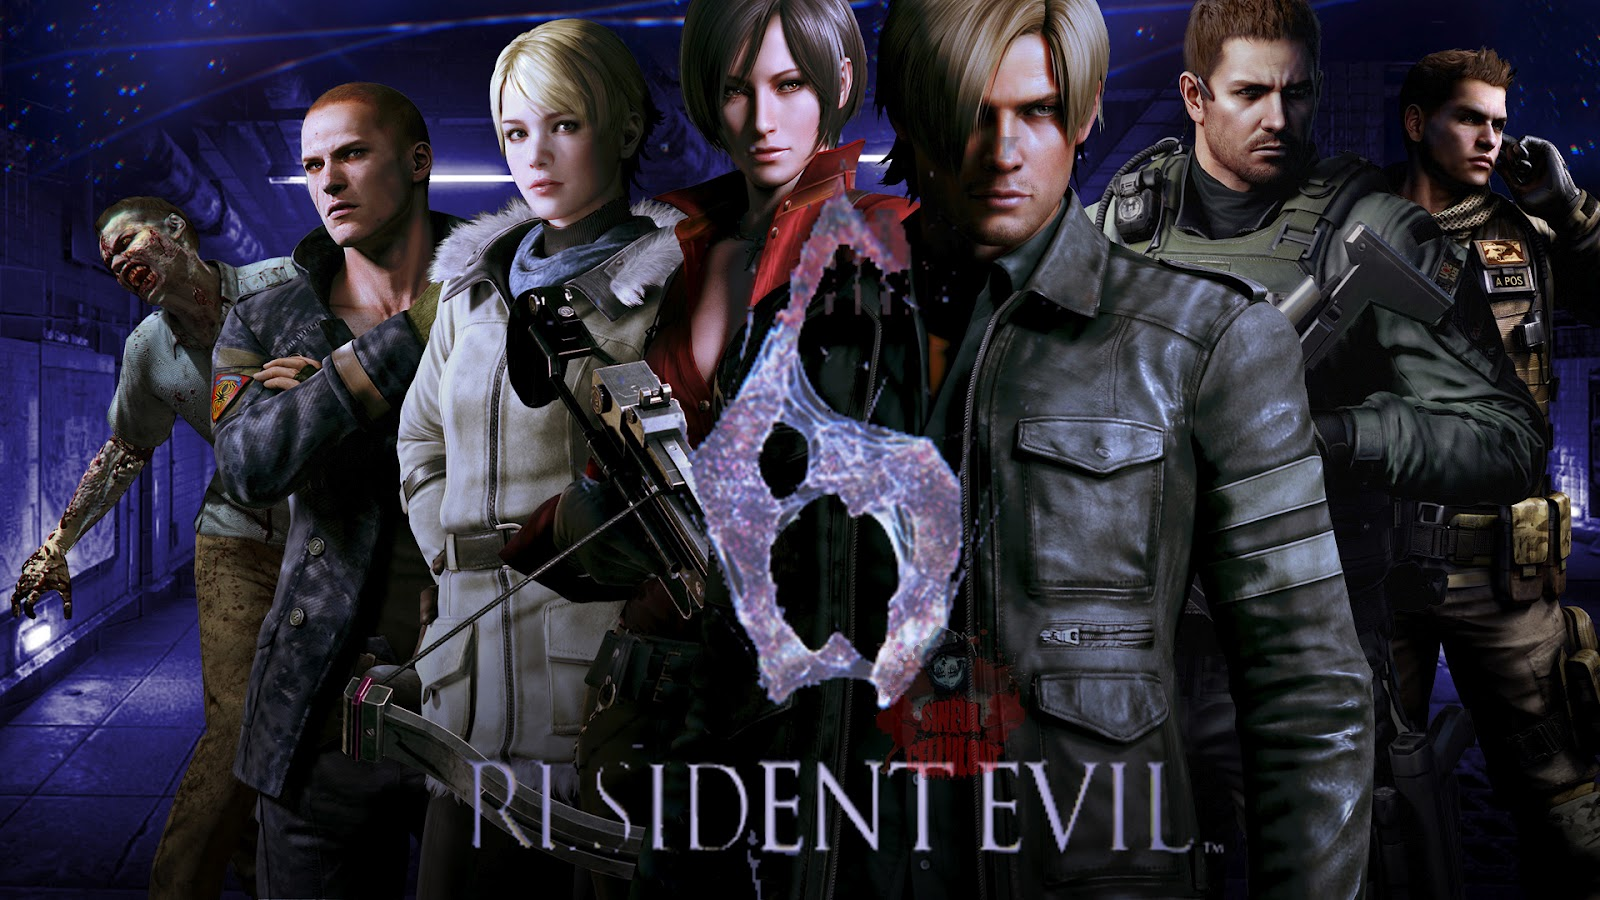 Resident evil 3: nemesis free download for windows 10, 7, 8/8. 1.